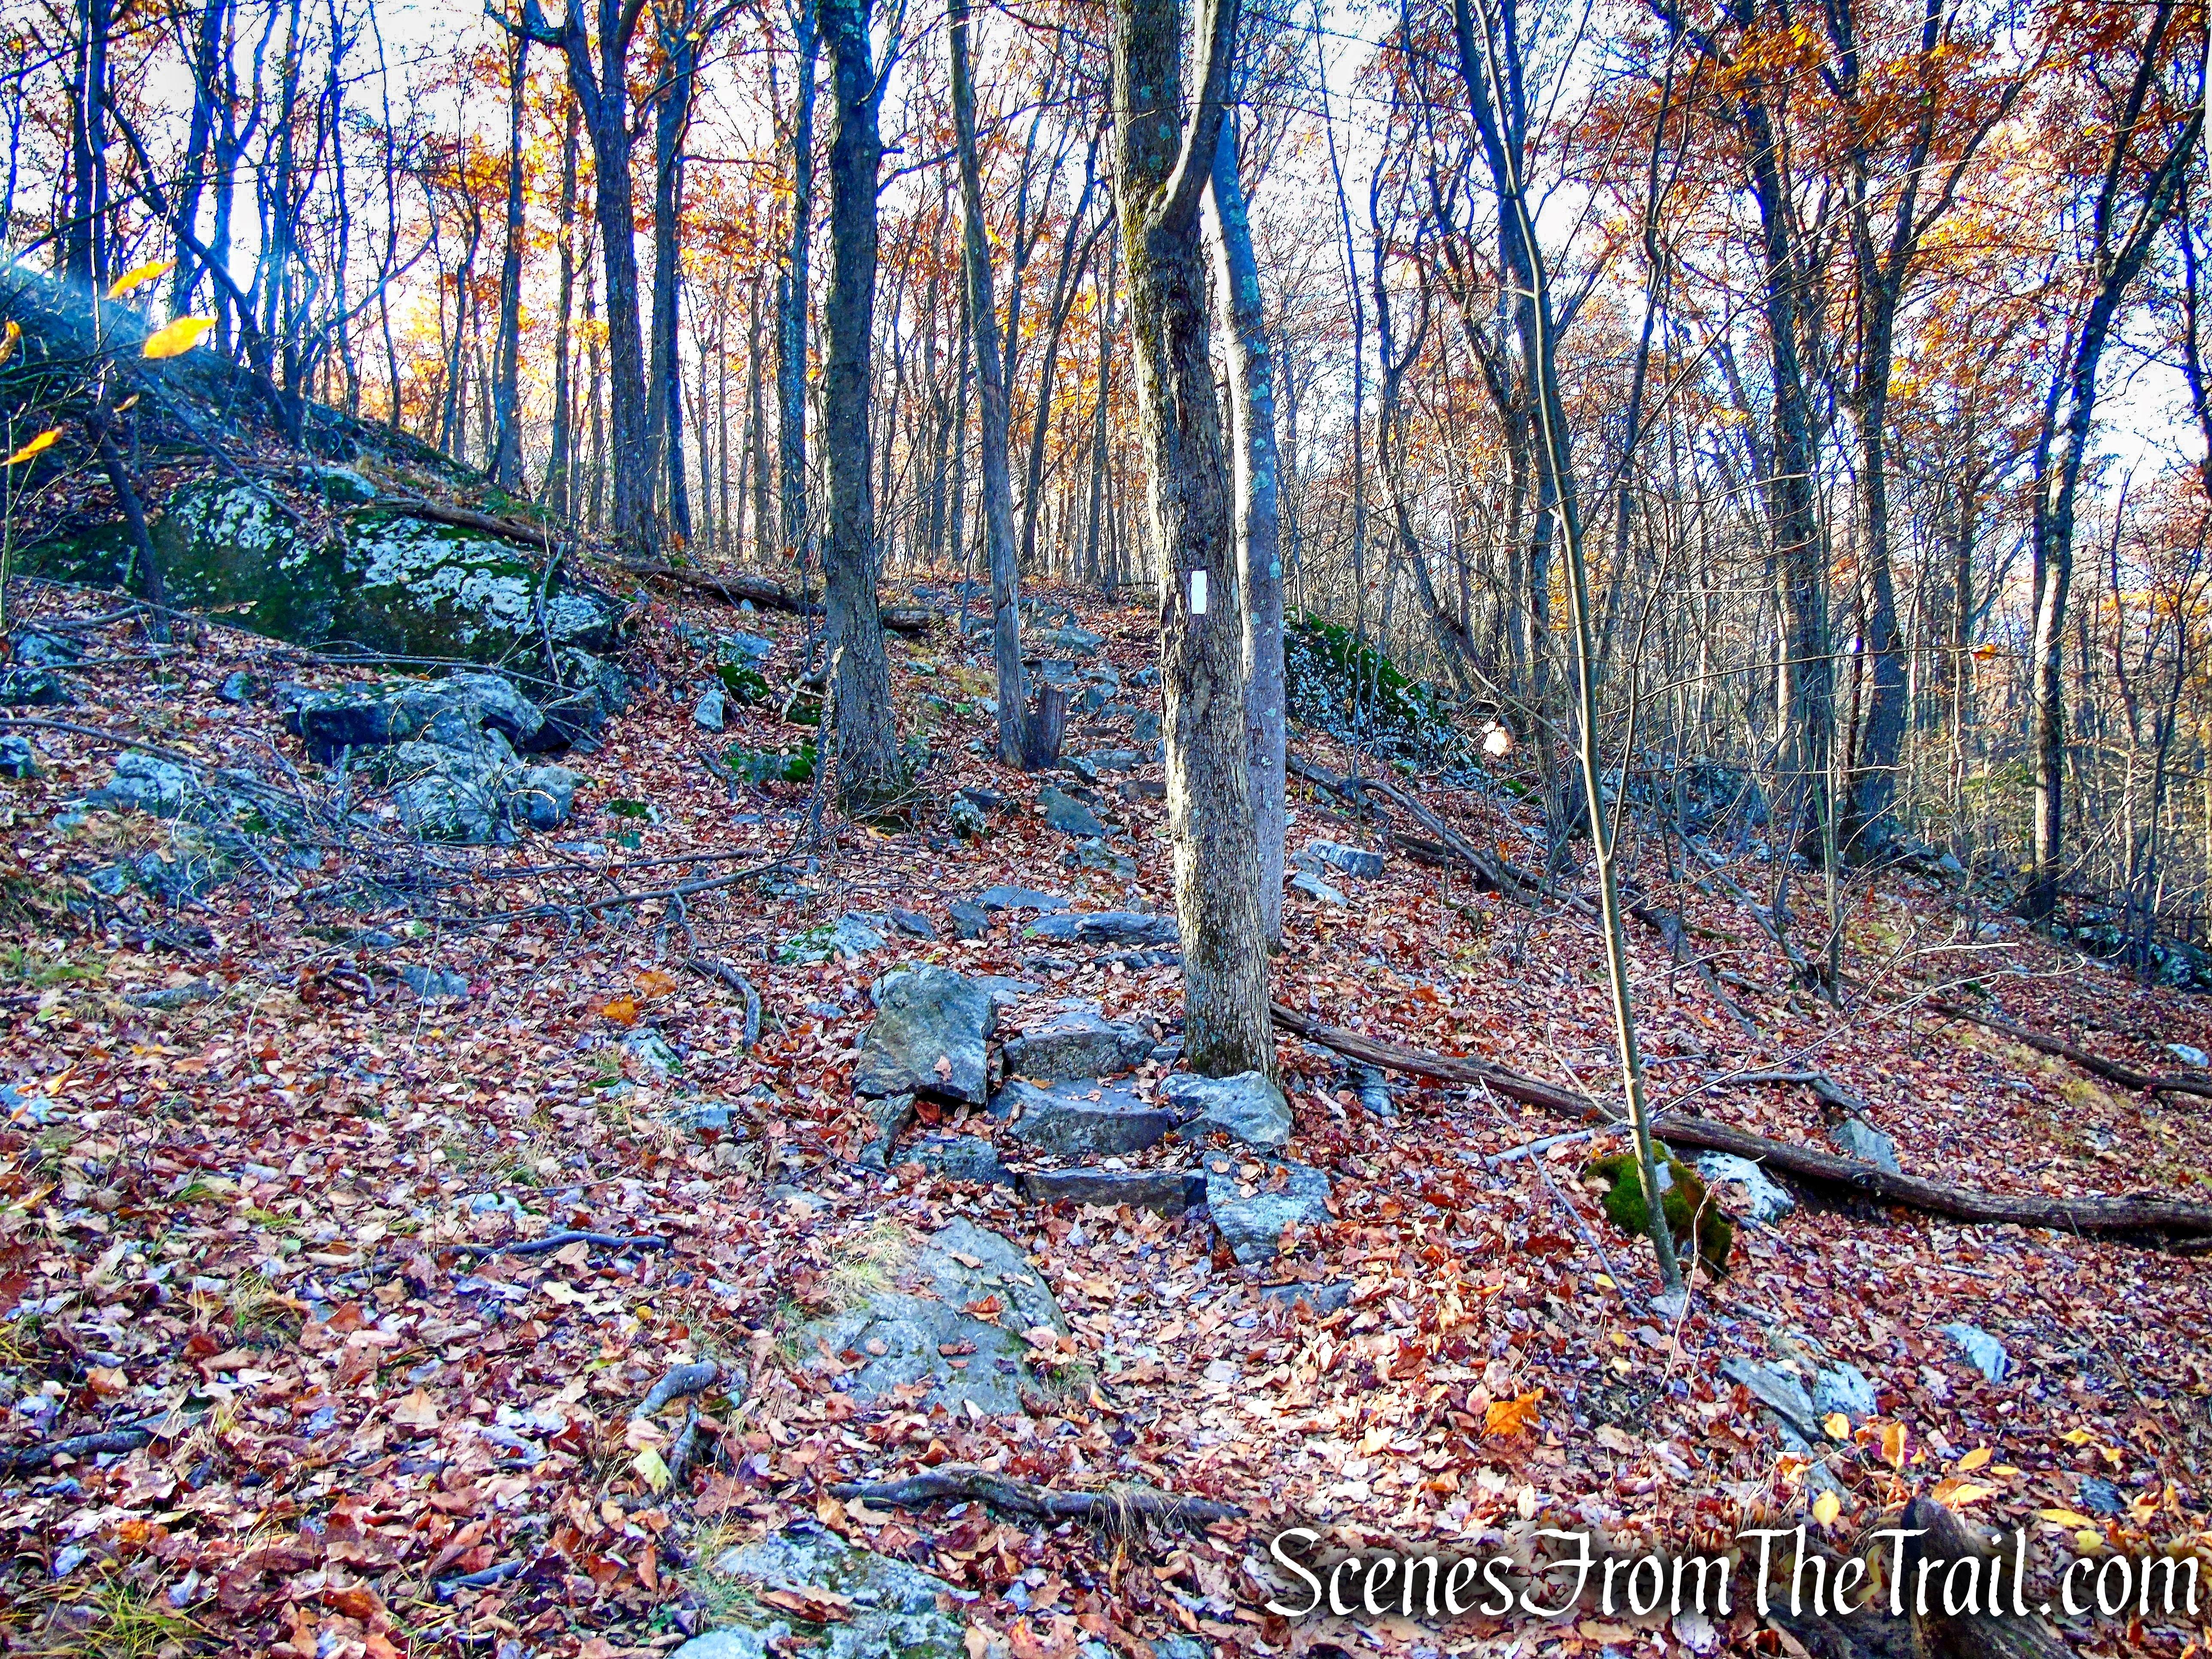 Appalachian Trail - Shenandoah Mountain